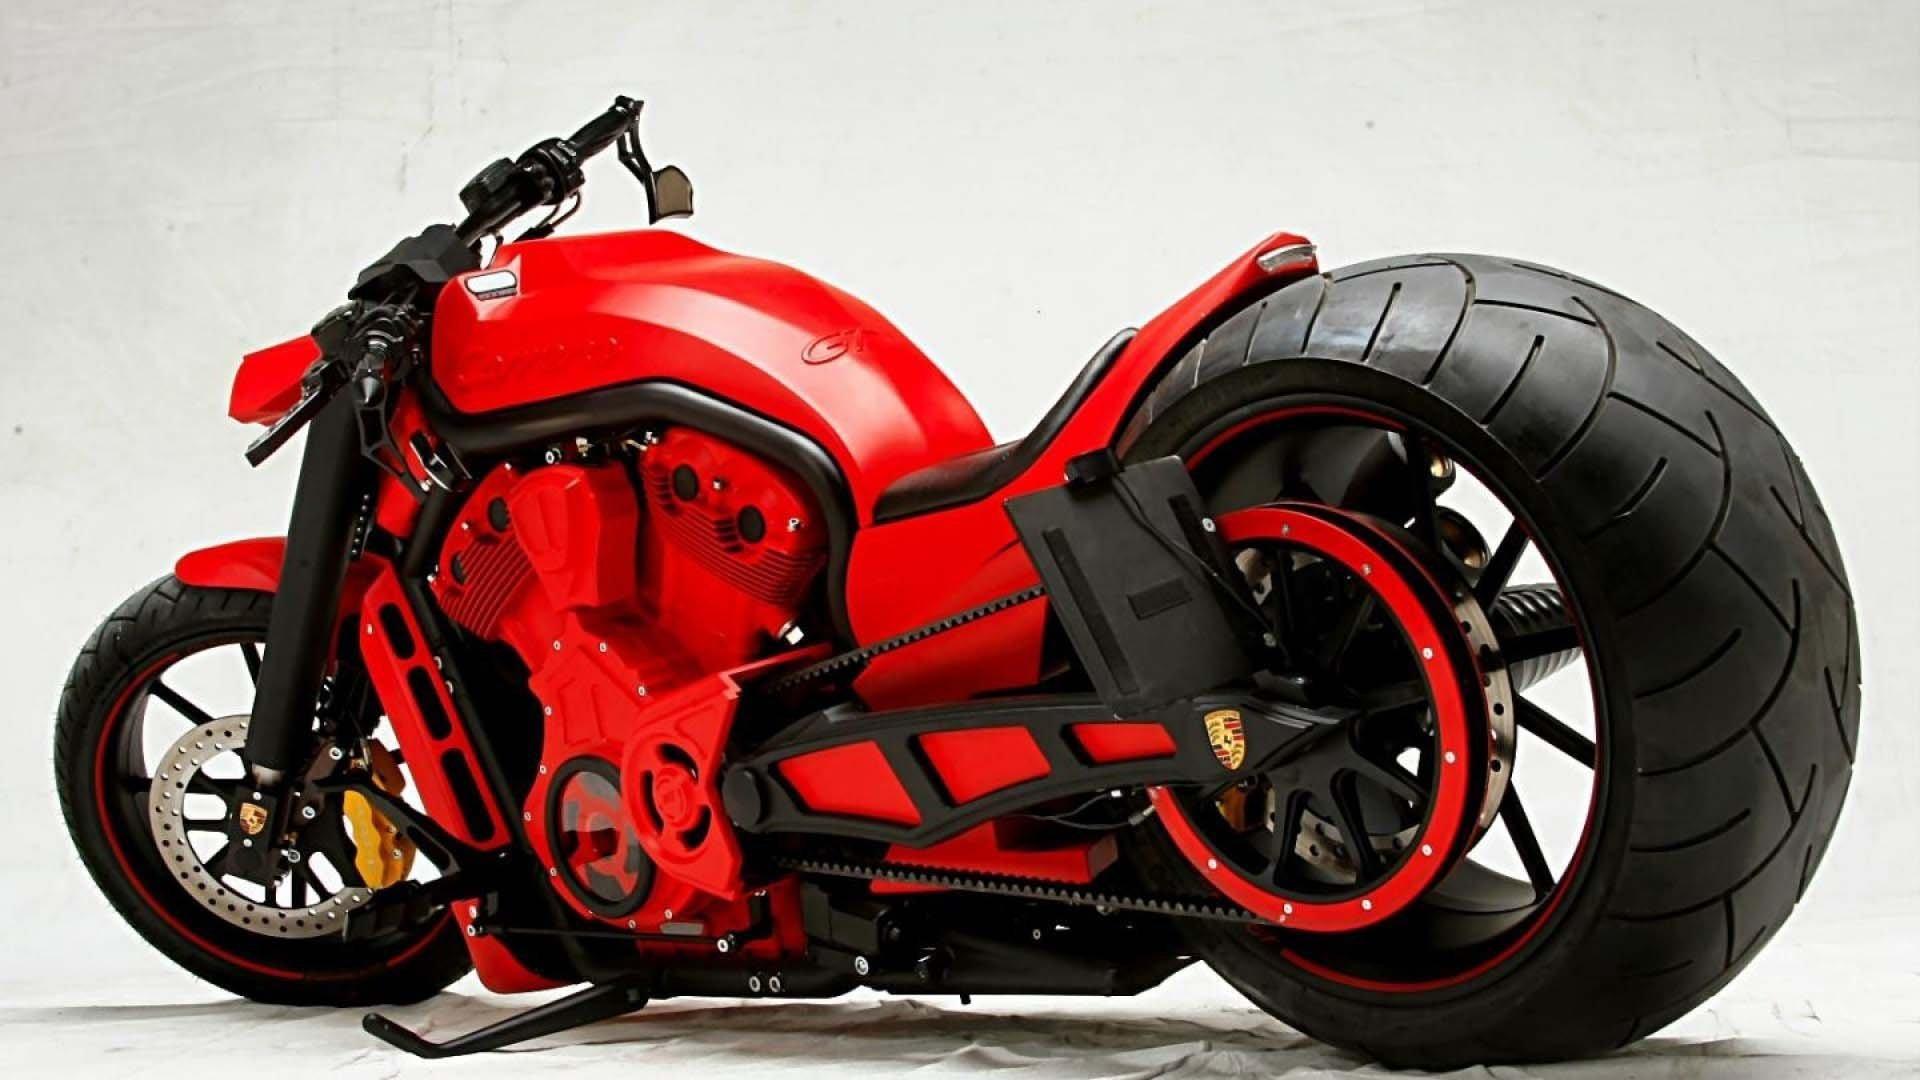 Motorcycle Wallpaper 8k